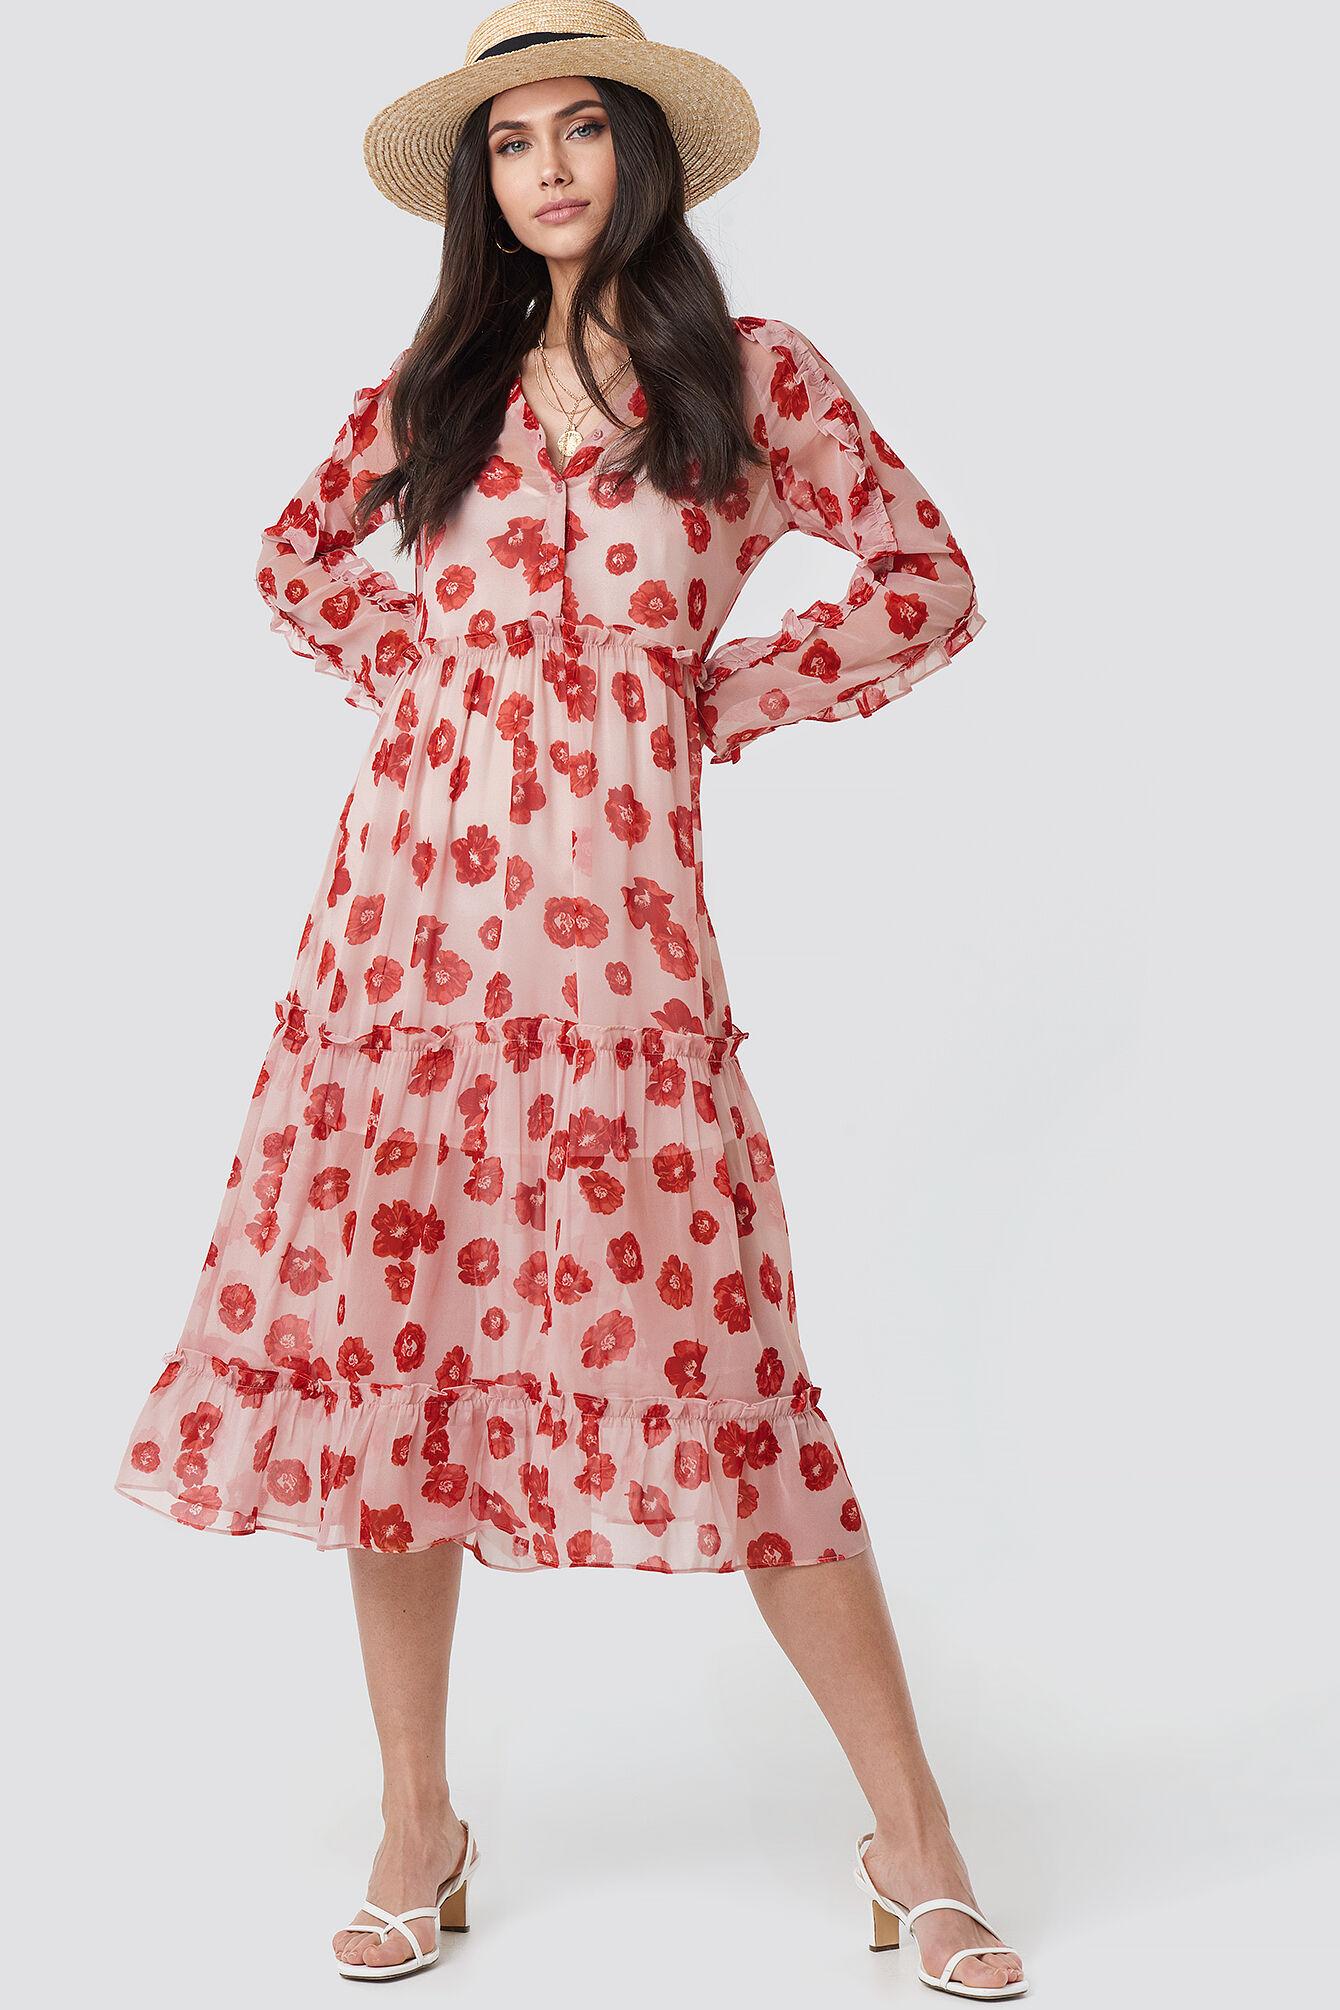 Image of NA-KD Boho Printed Flounce Chiffon Dress - Pink,Red